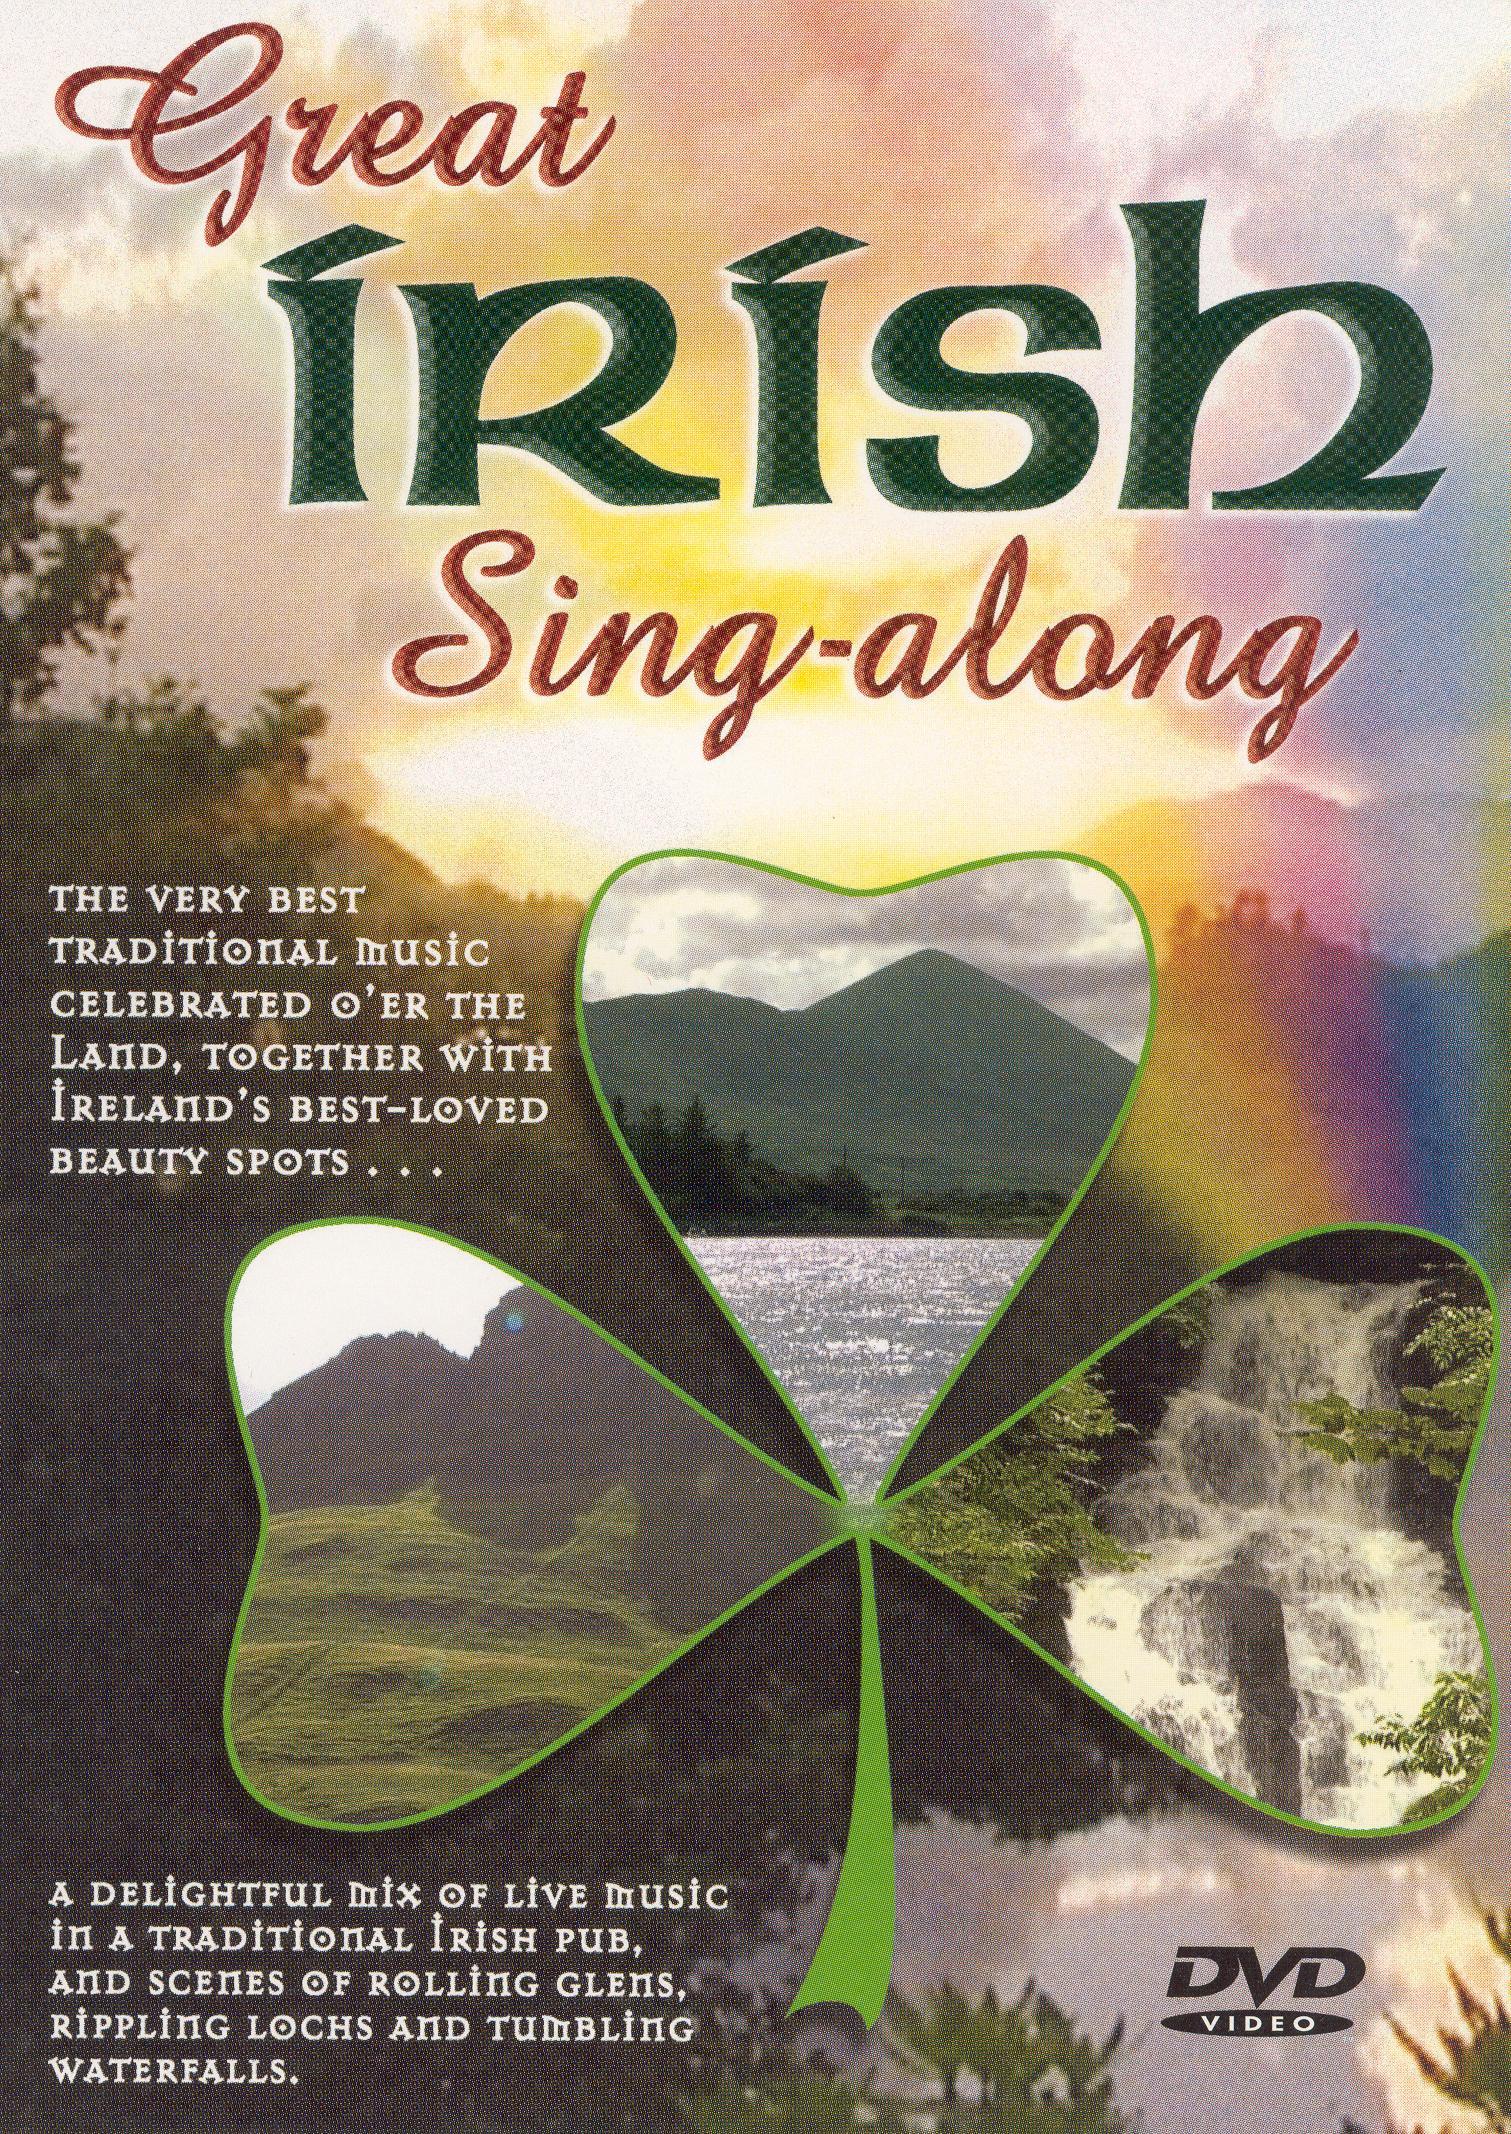 Great Irish Sing-Along